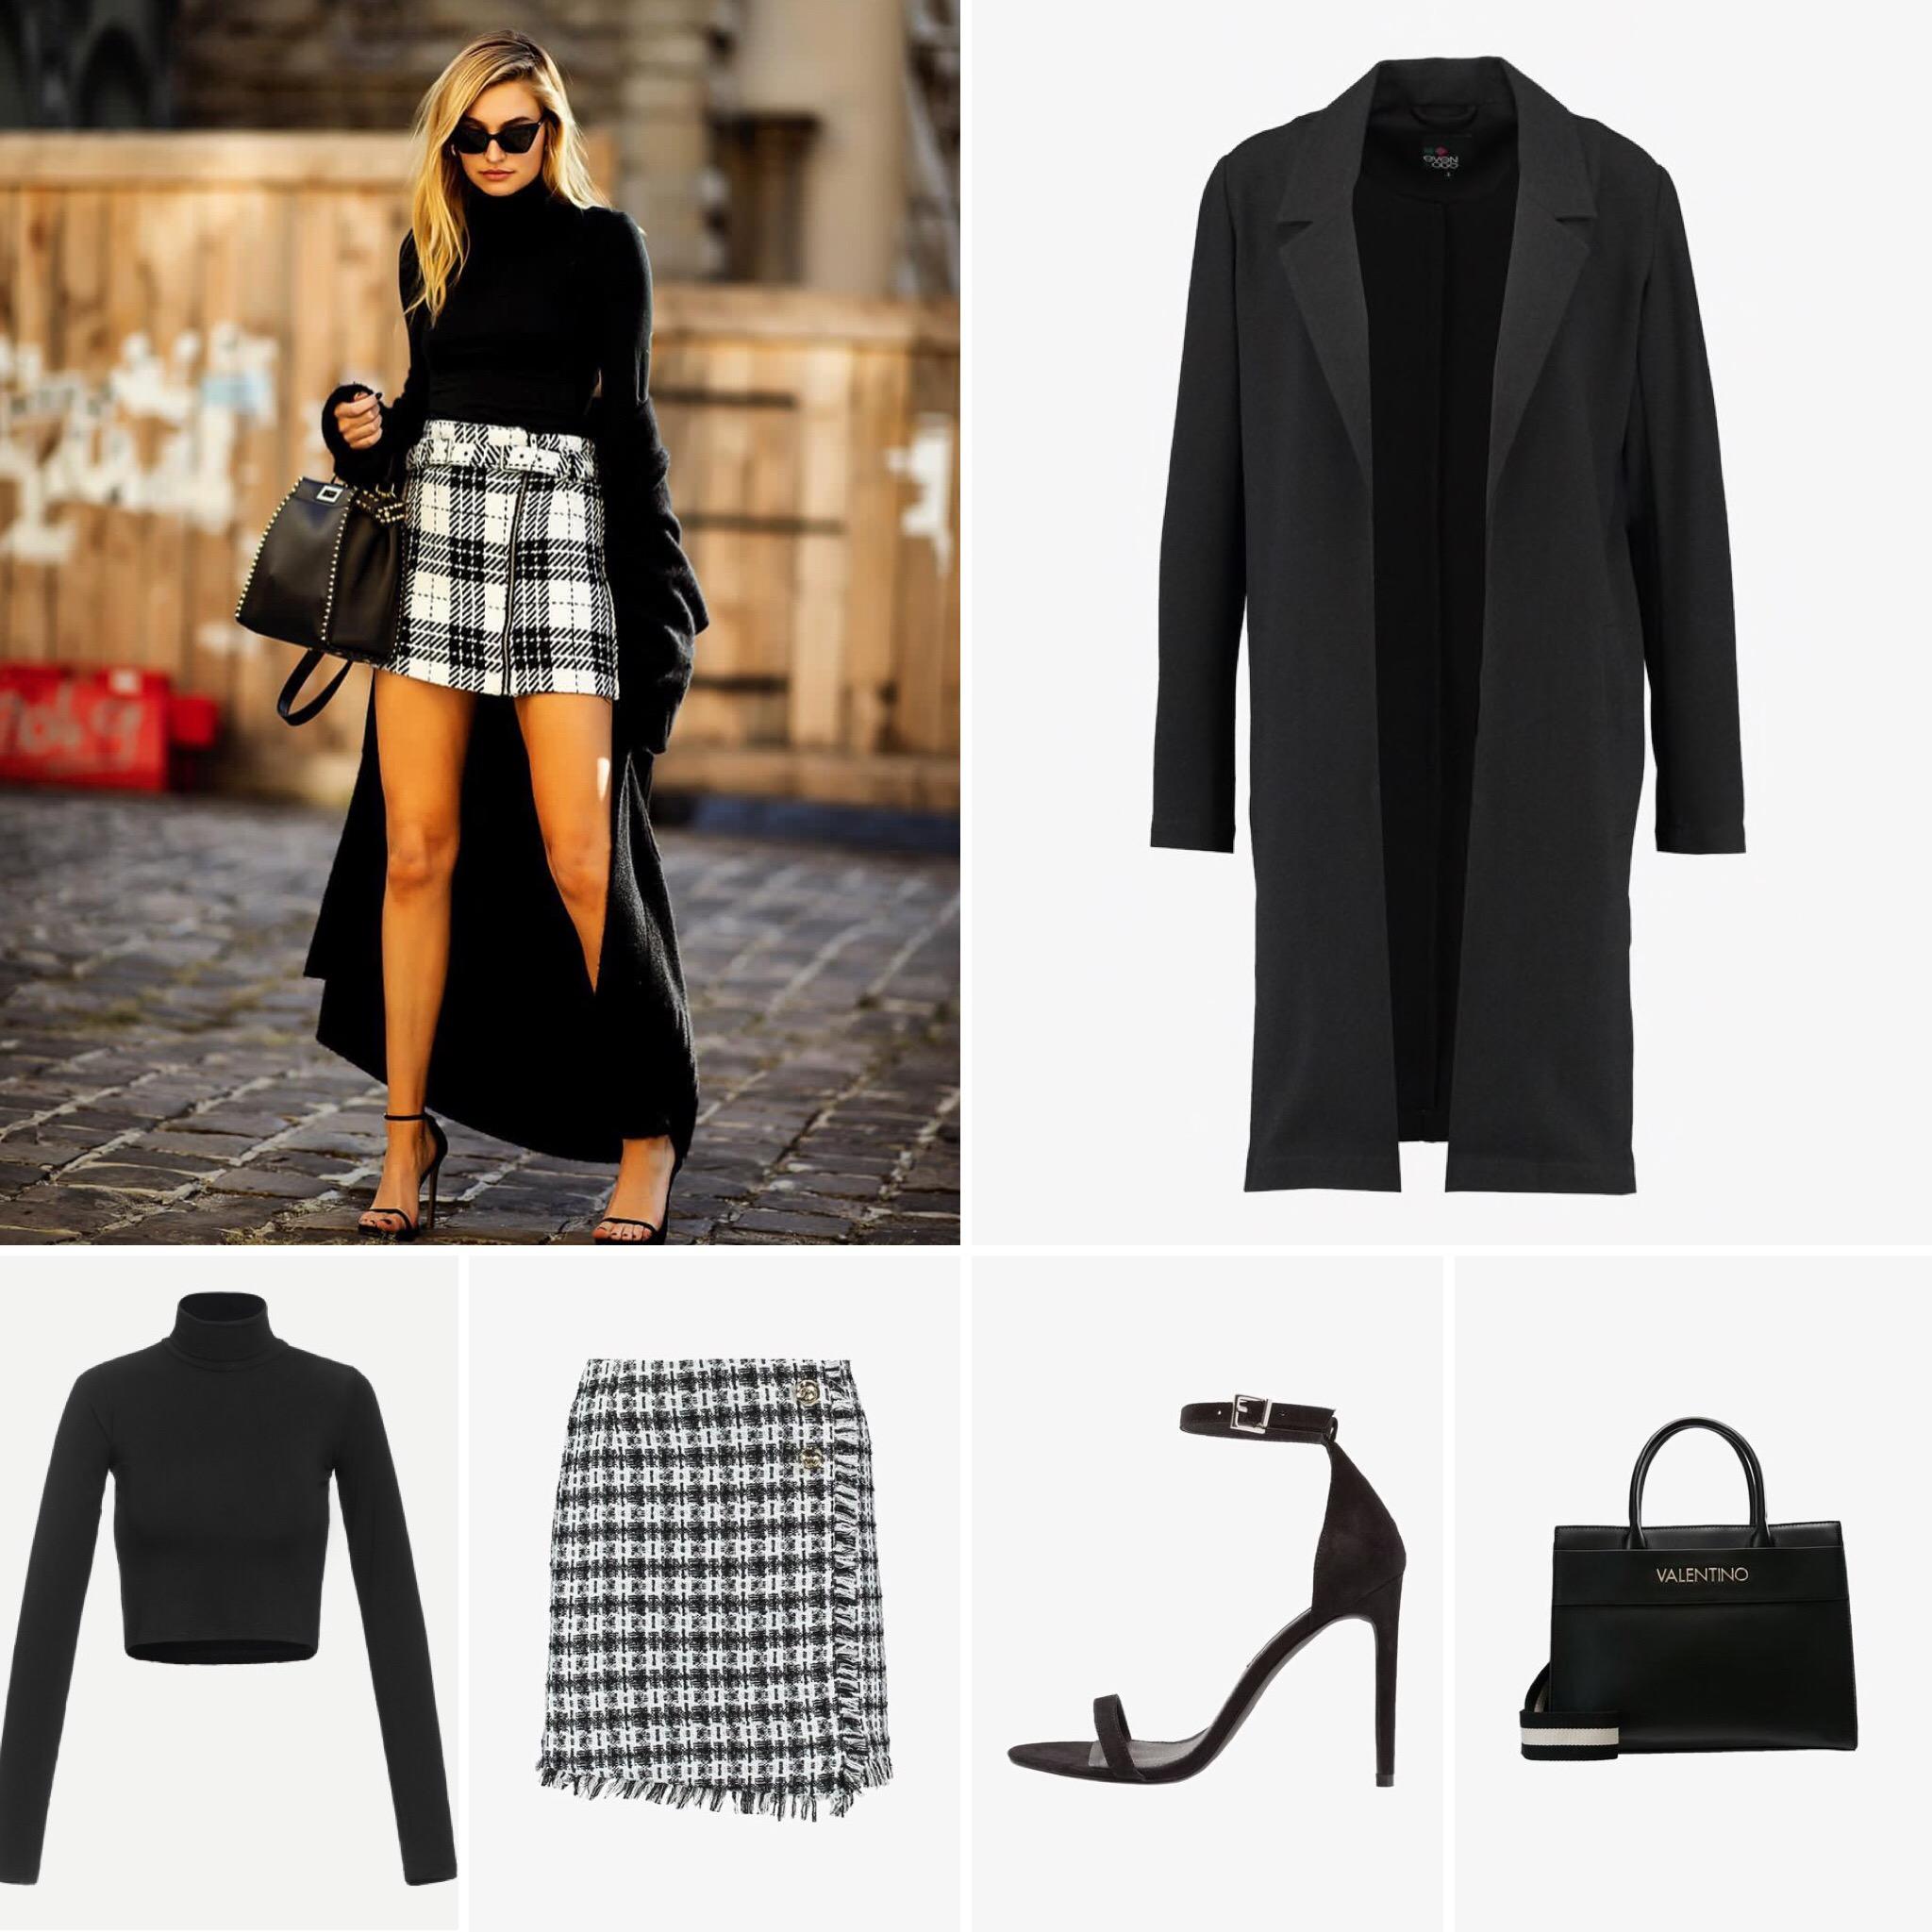 De Look Street Style Bests Paris Girlz Les Black Fashion La Week kuOXiPZ